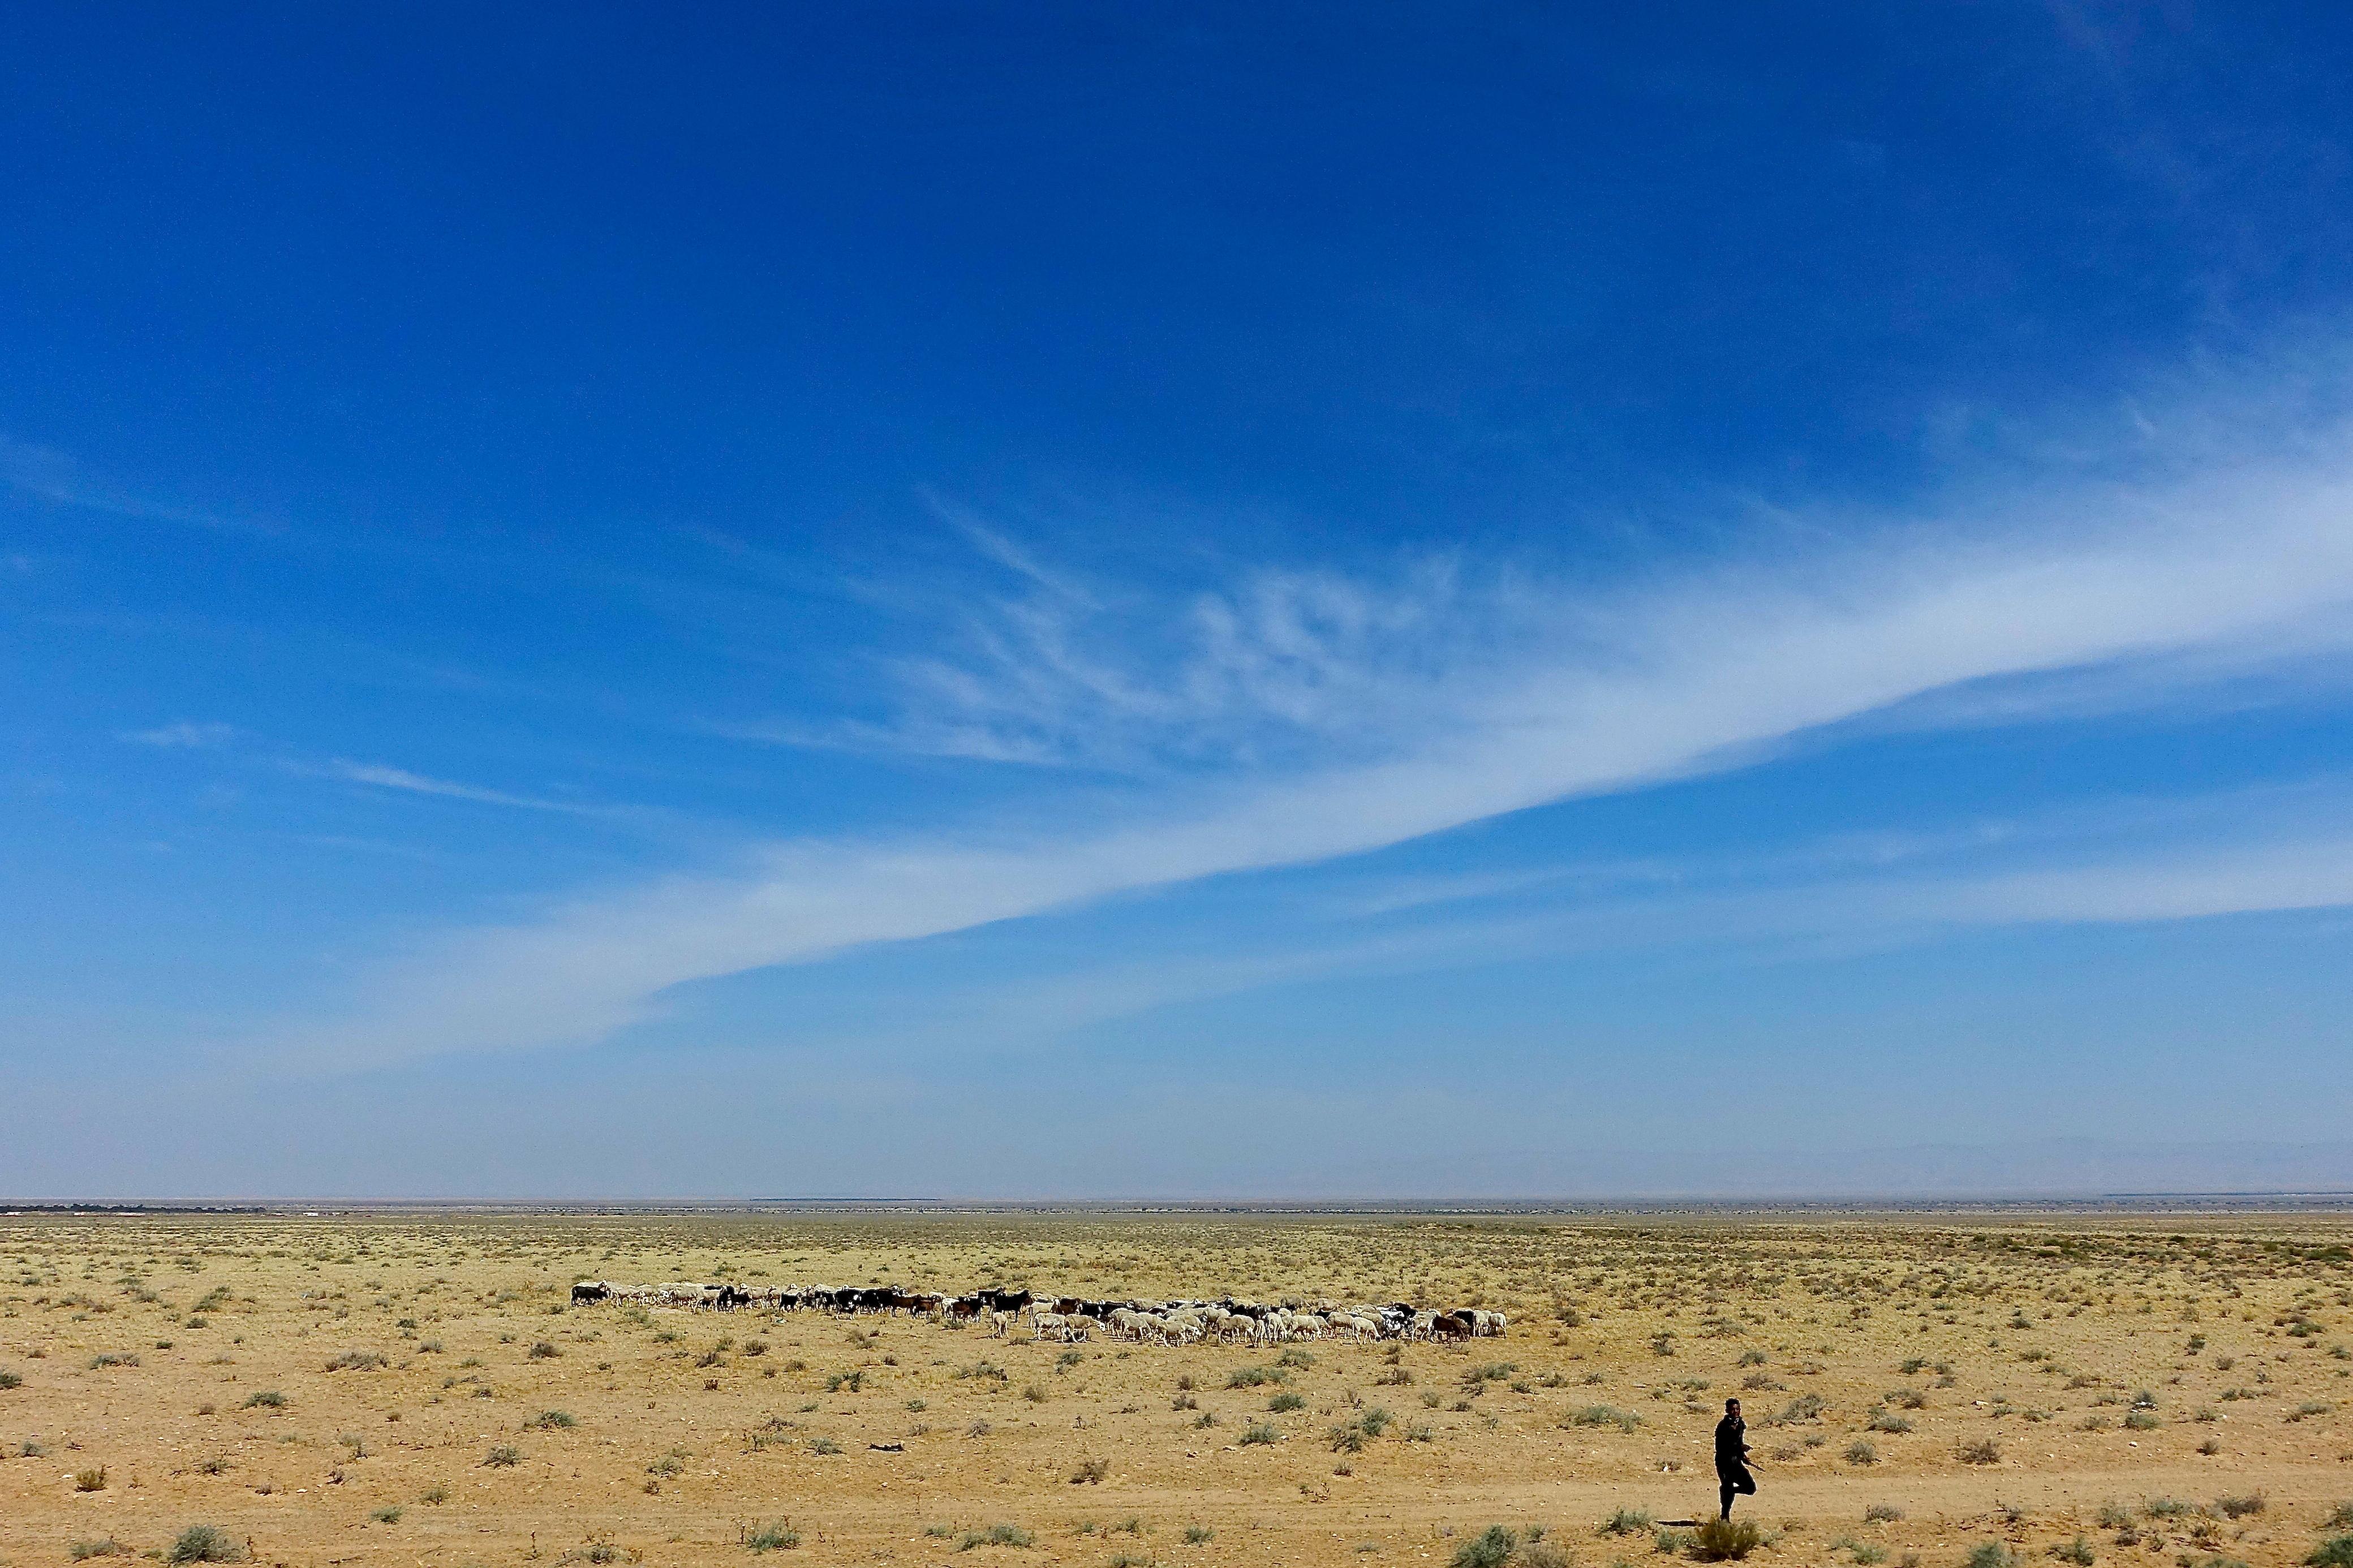 Herding Goats. Tunisia